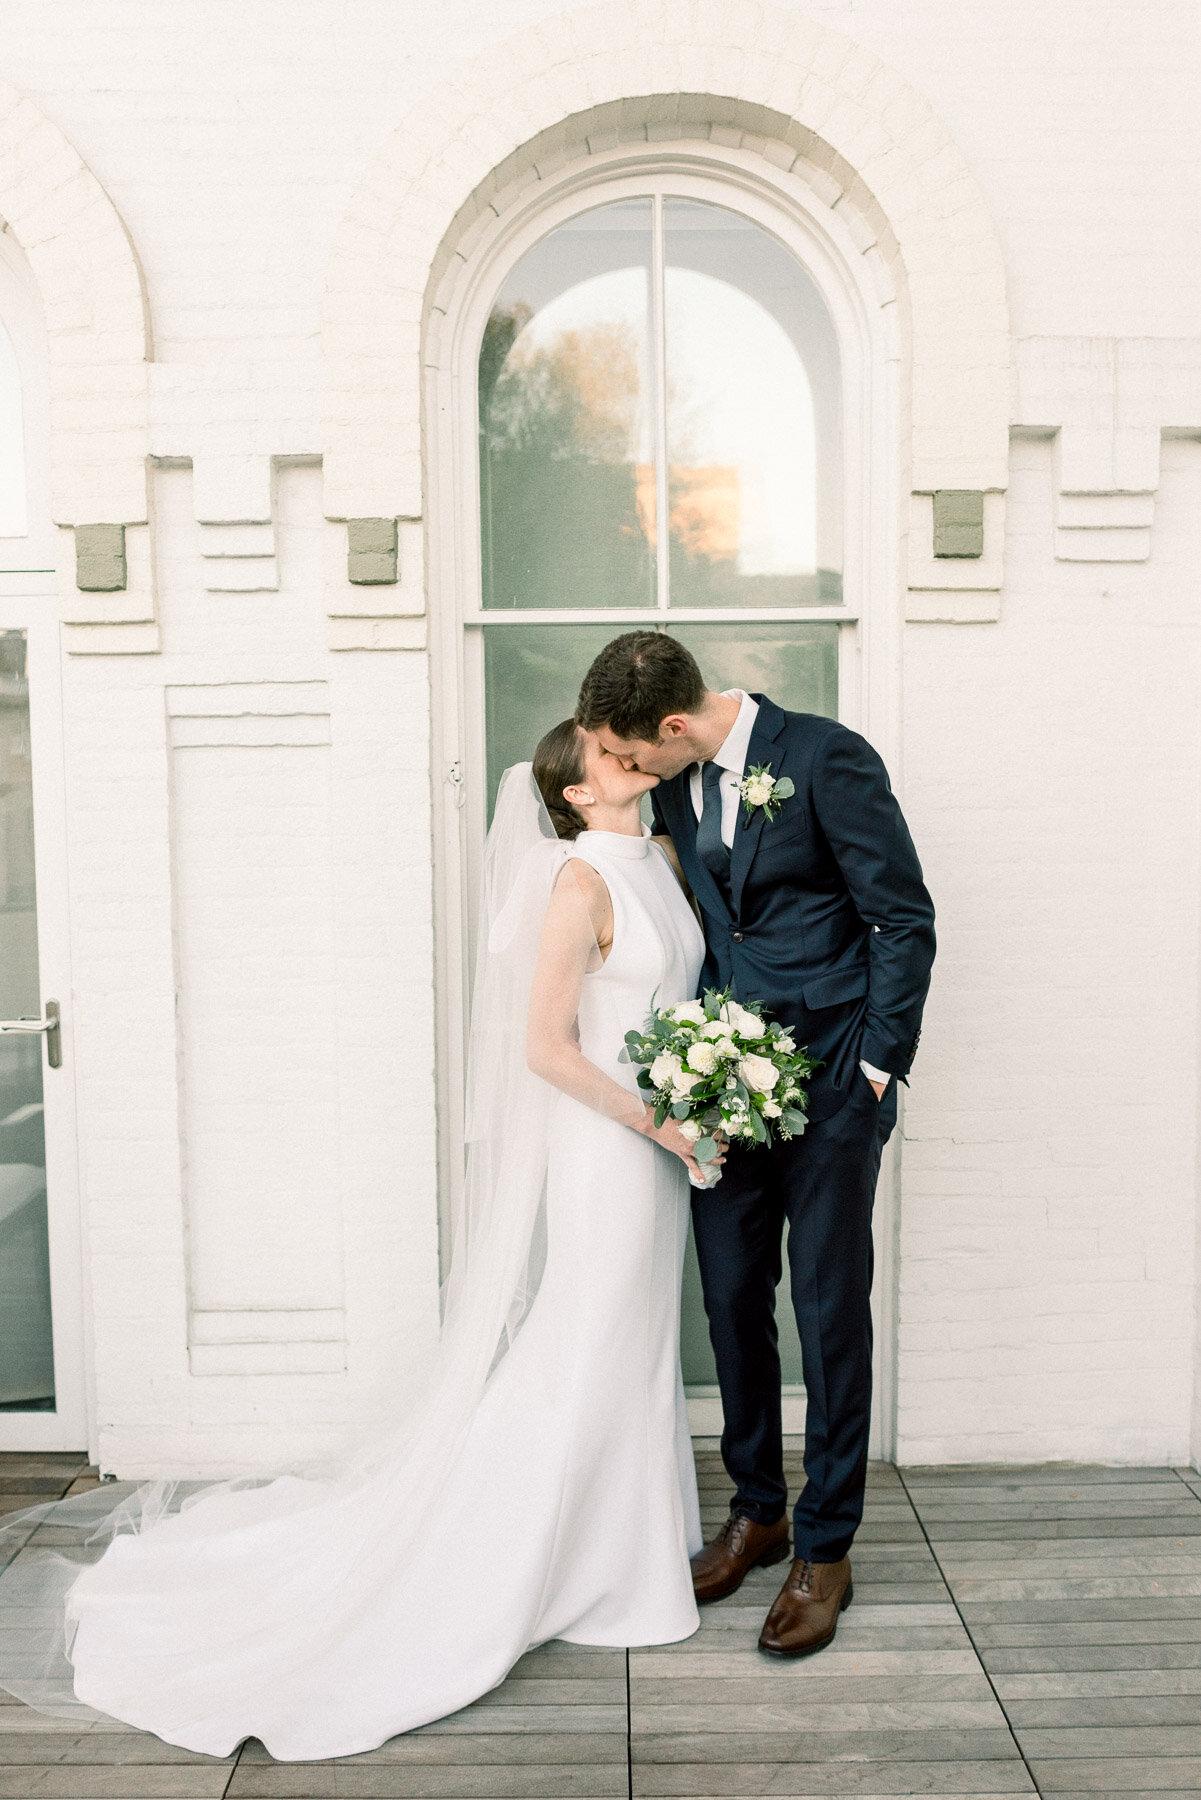 Adelphi Saratoga Wedding by Michelle Lange Photography-34.jpg